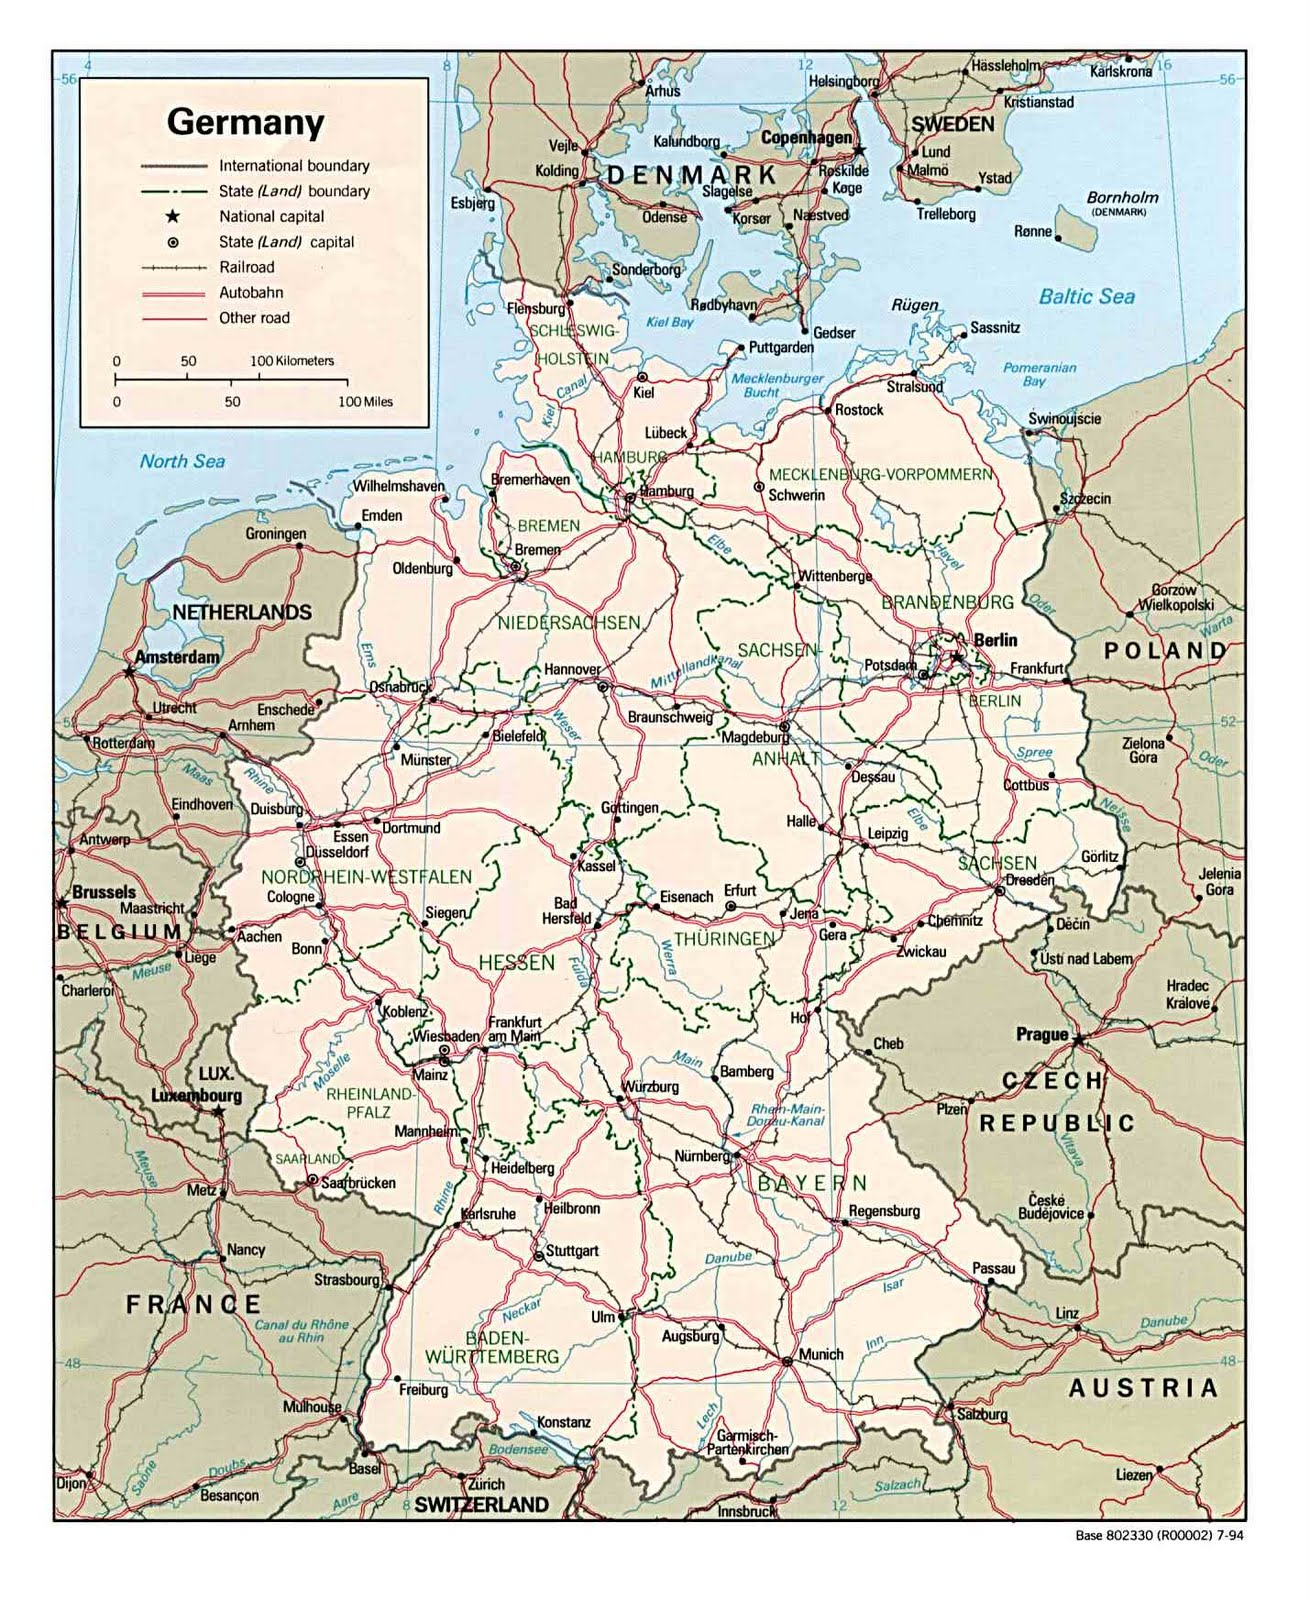 tyskland landets karta sverige stadskarta geografi plats